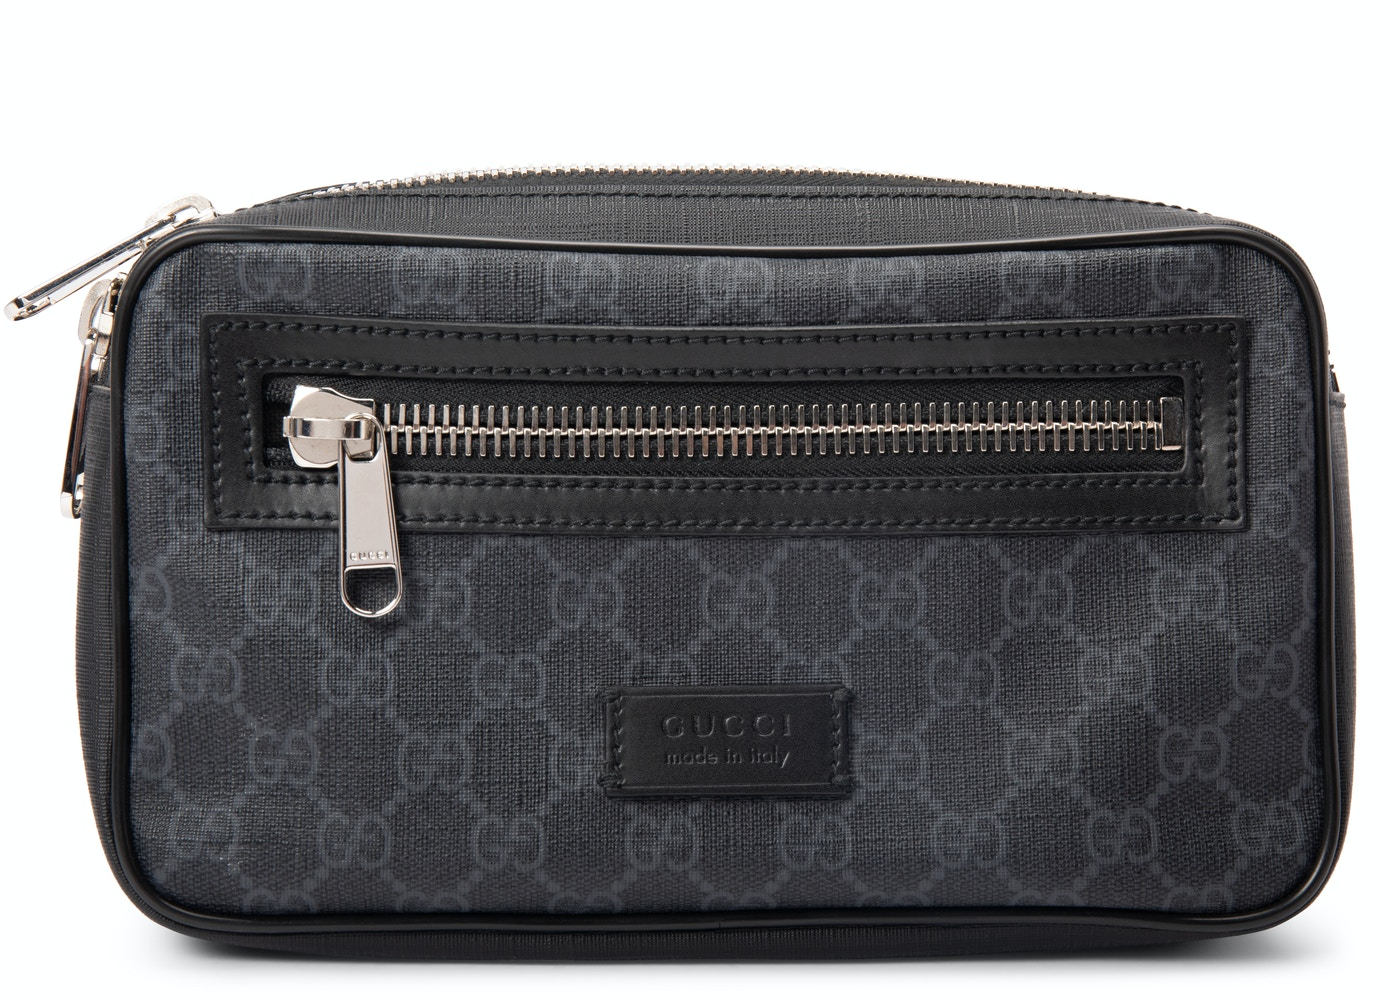 a05a144e8f4 Gucci Belt Bag Soft GG Supreme Web Strap Black Red